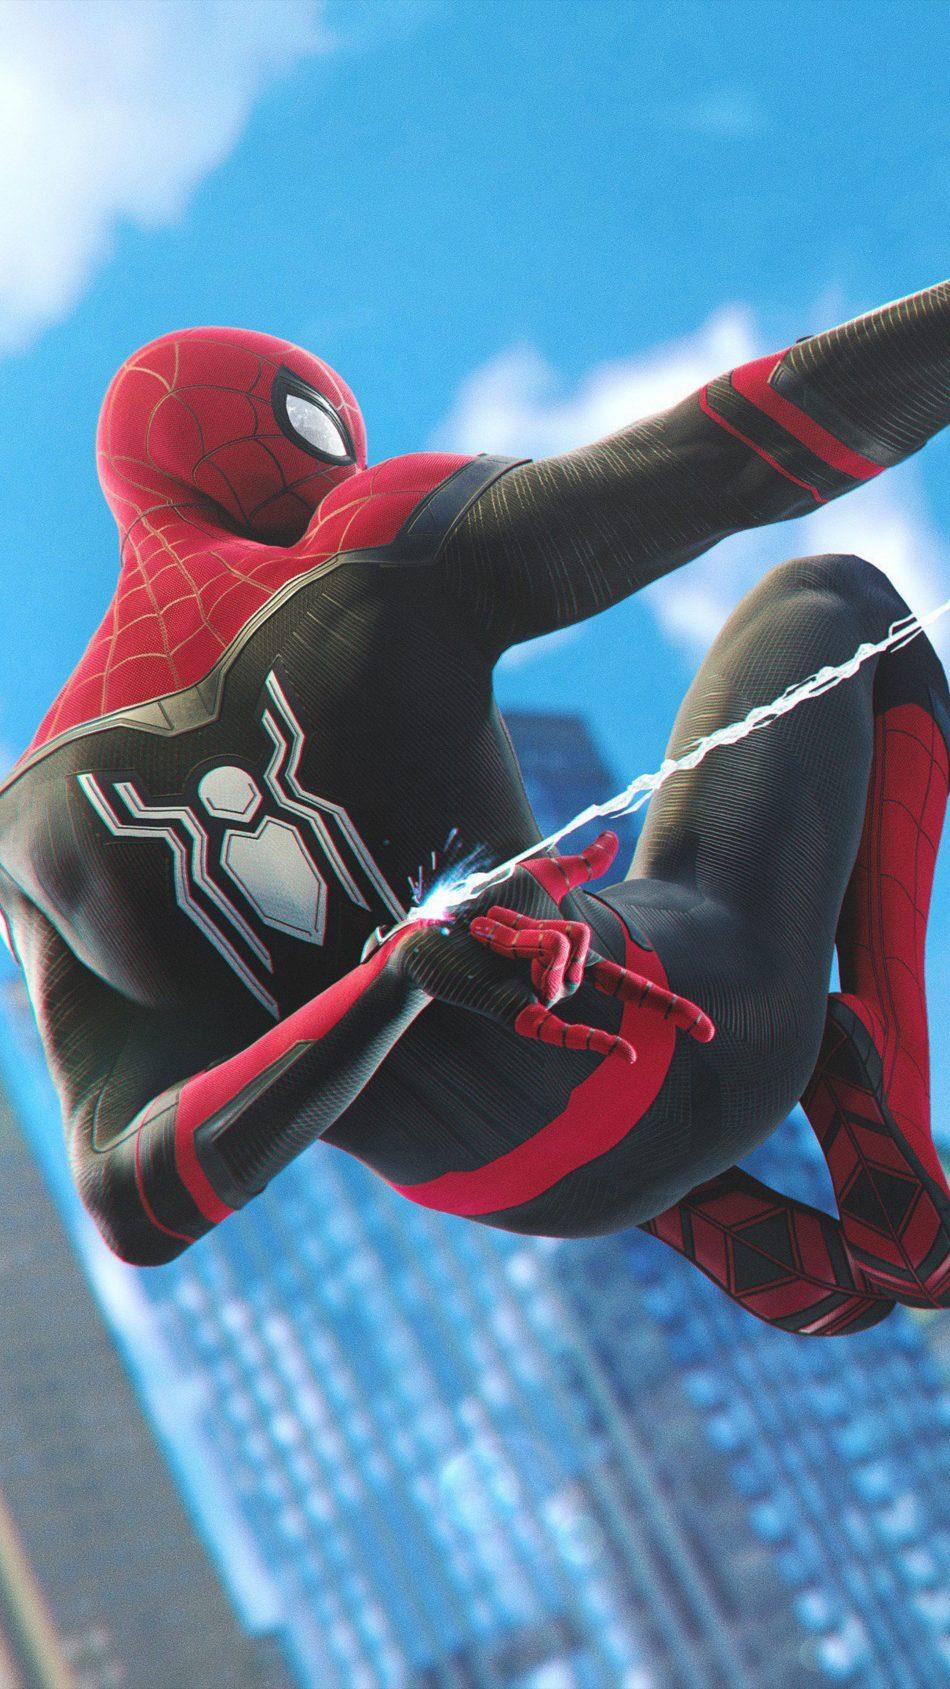 Spider Man Ps4 4k Wallpaper Posted By Sarah Mercado